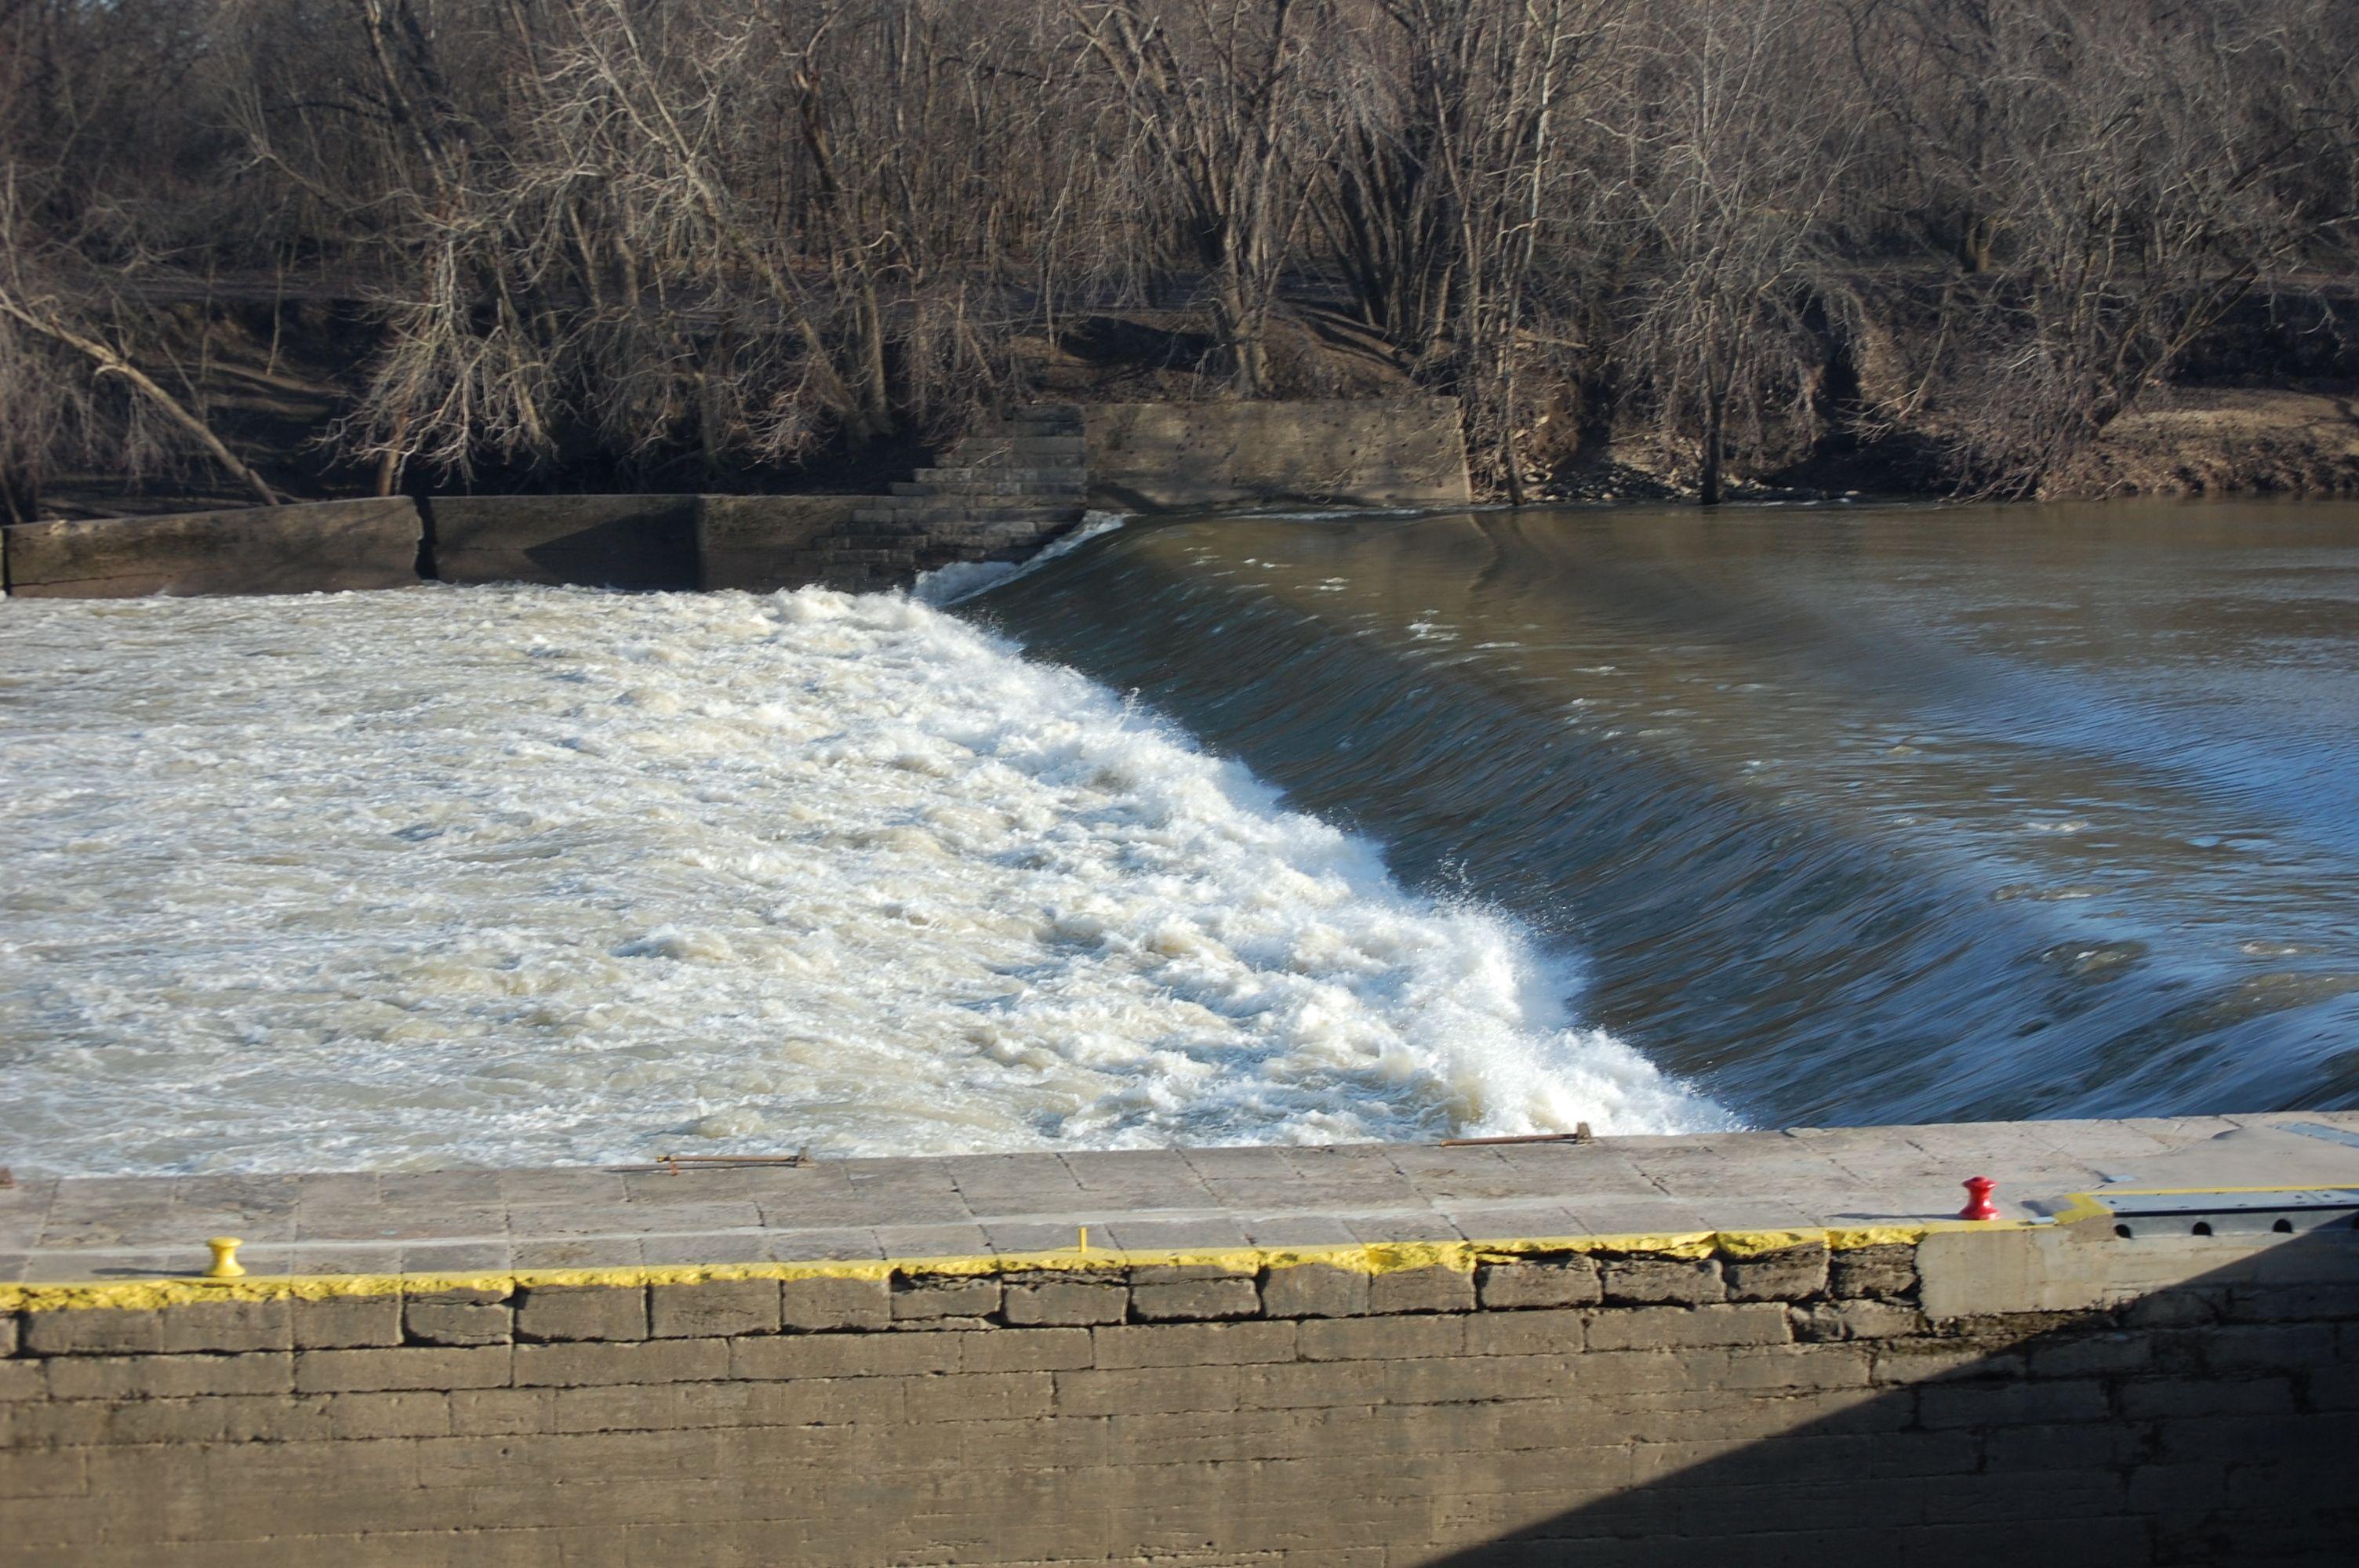 Lock 2 on the Kentucky River Lock